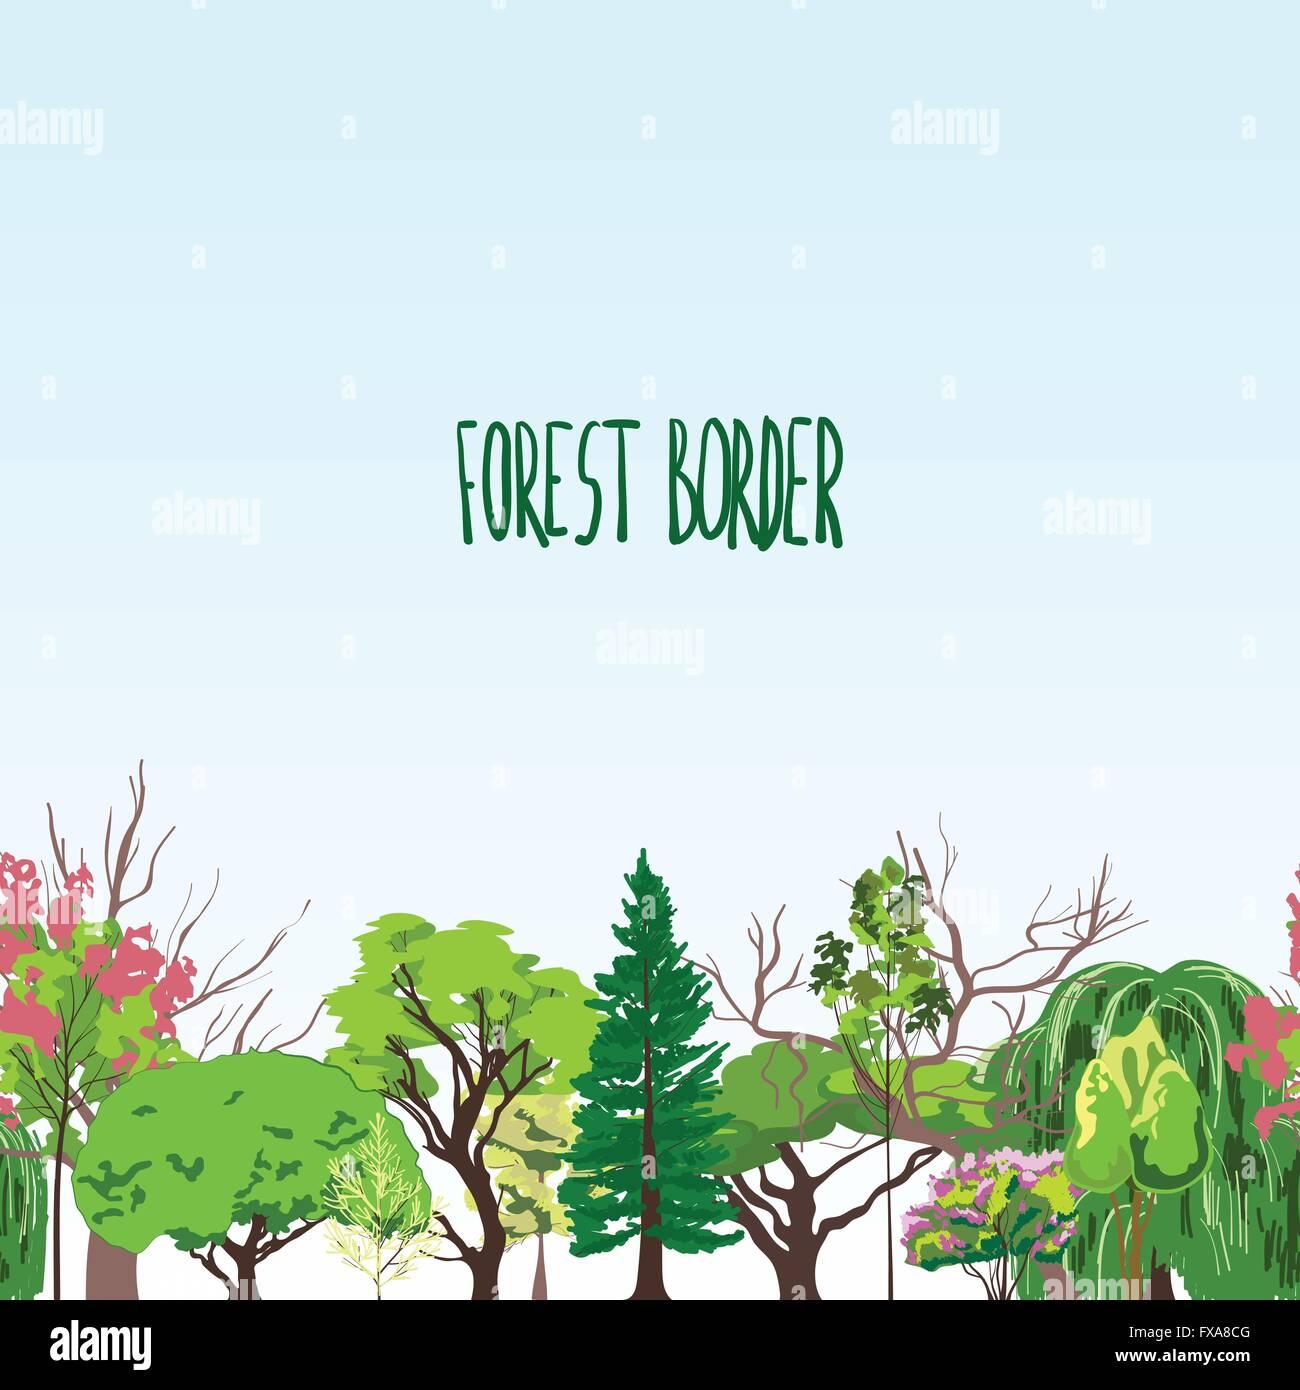 Fotest border trees sketch - Stock Vector